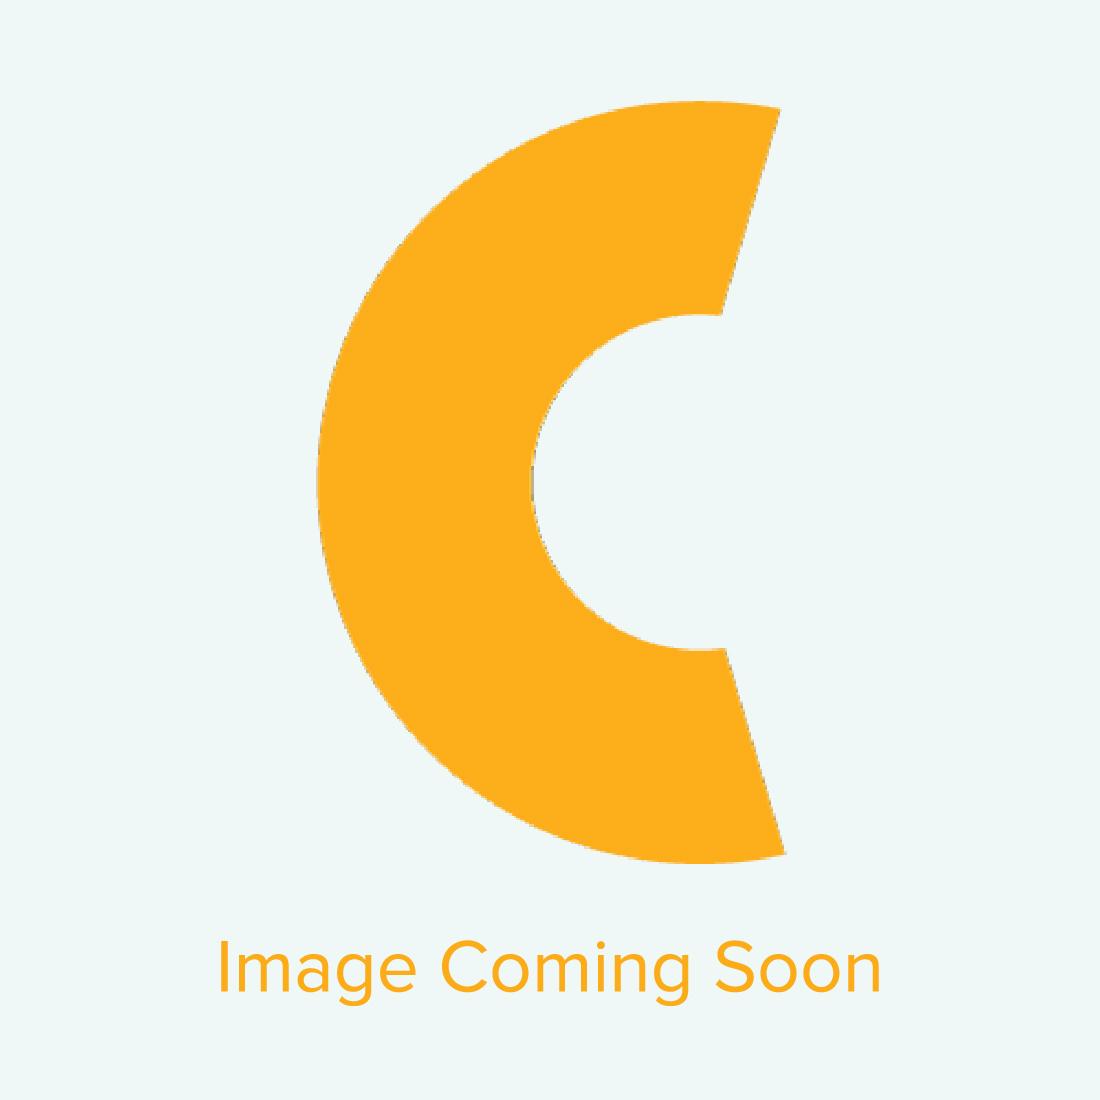 "Sublimation MDF Coaster w/ Cork Back - 4"" x 4"" (300/case) - OVERSTOCK"